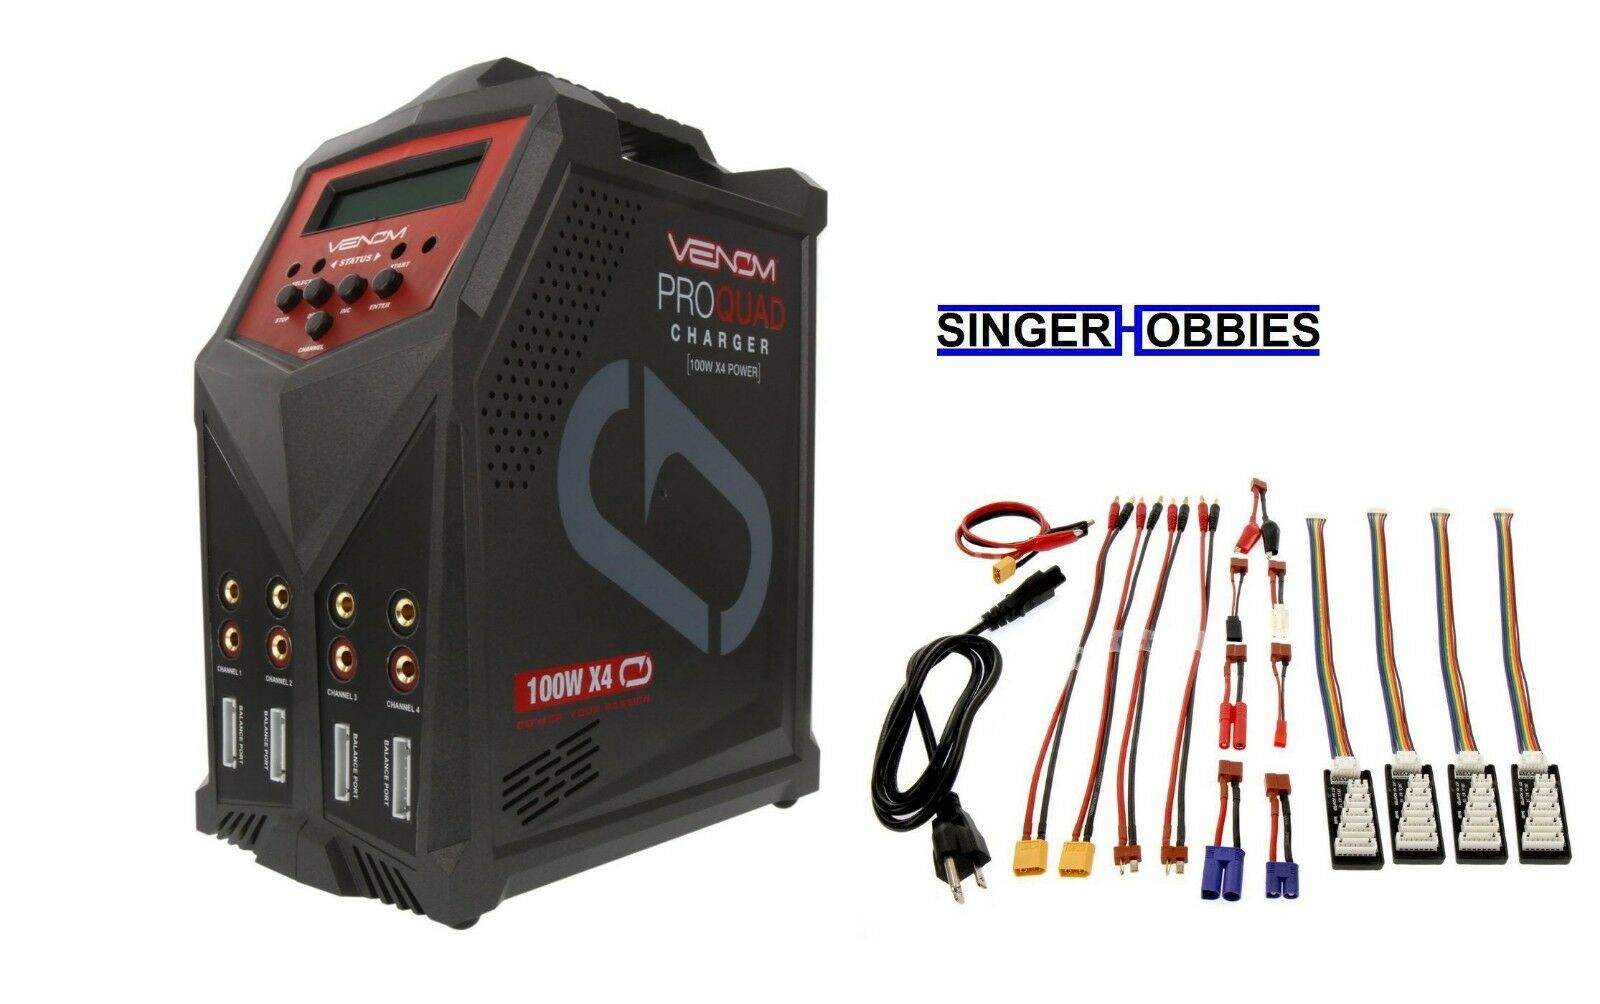 Venom Pro Quad 100W 7A 4-Puerto AC DC cargador de batería VNR0686 HH